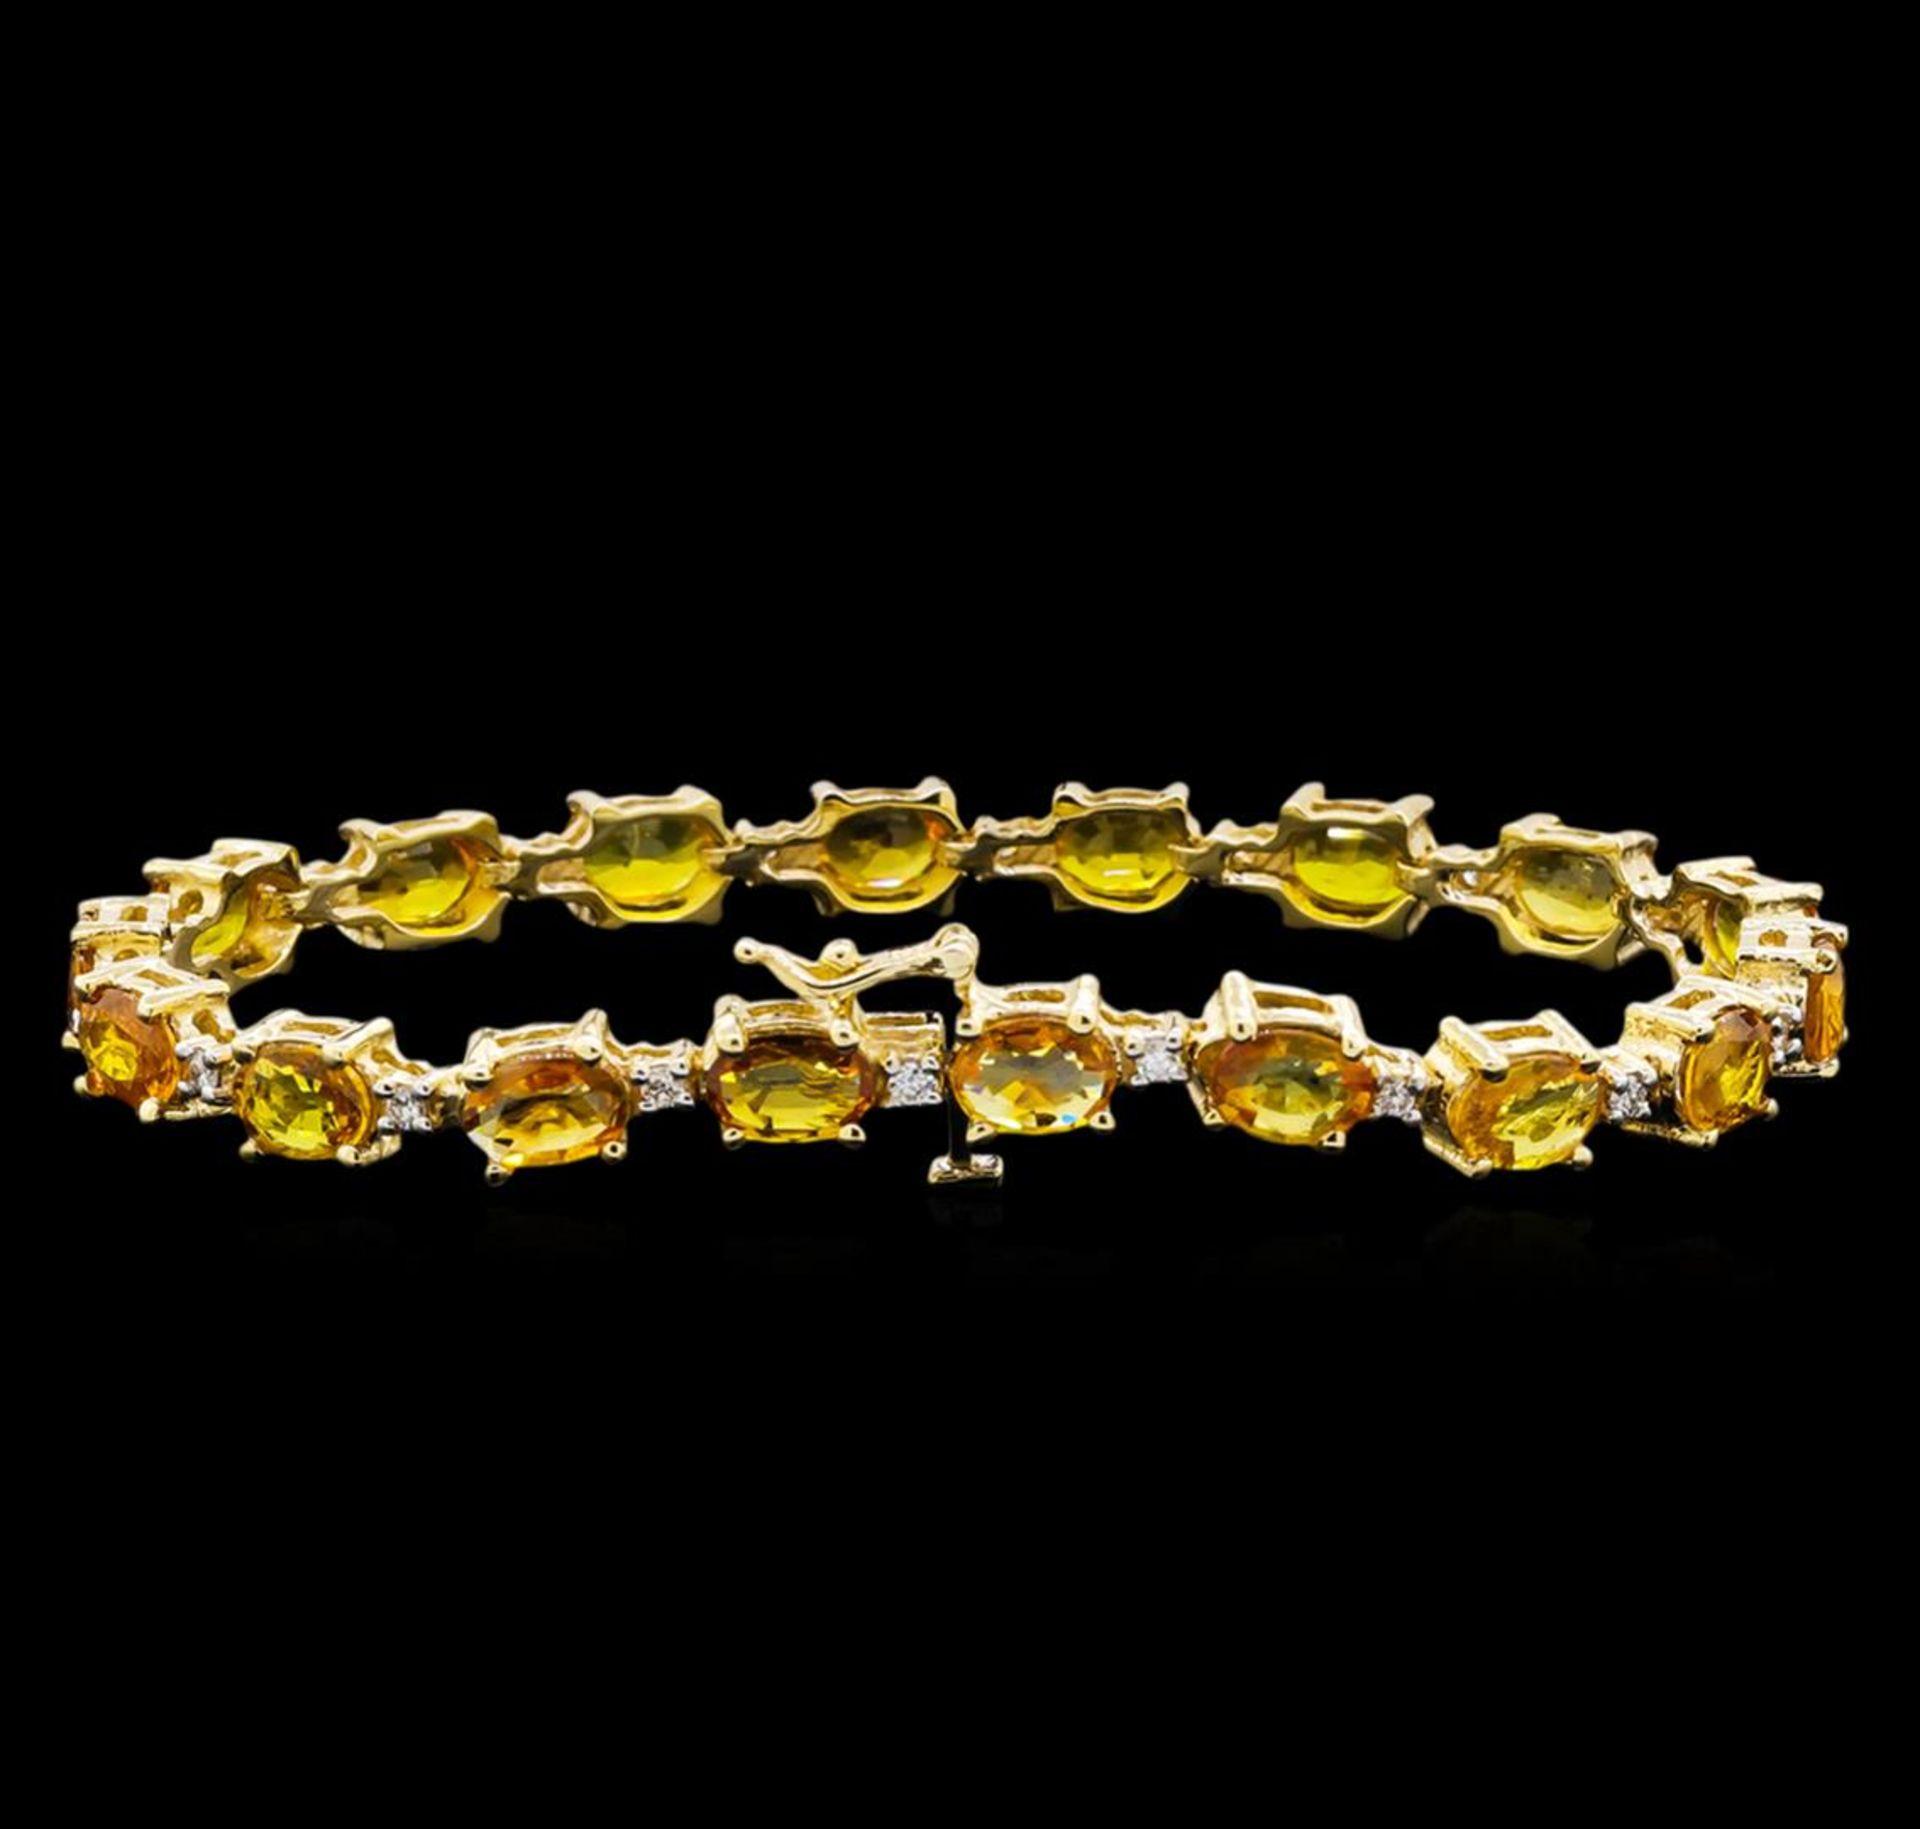 15.57 ctw Yellow Sapphire and Diamond Bracelet - 14KT Yellow Gold - Image 2 of 4